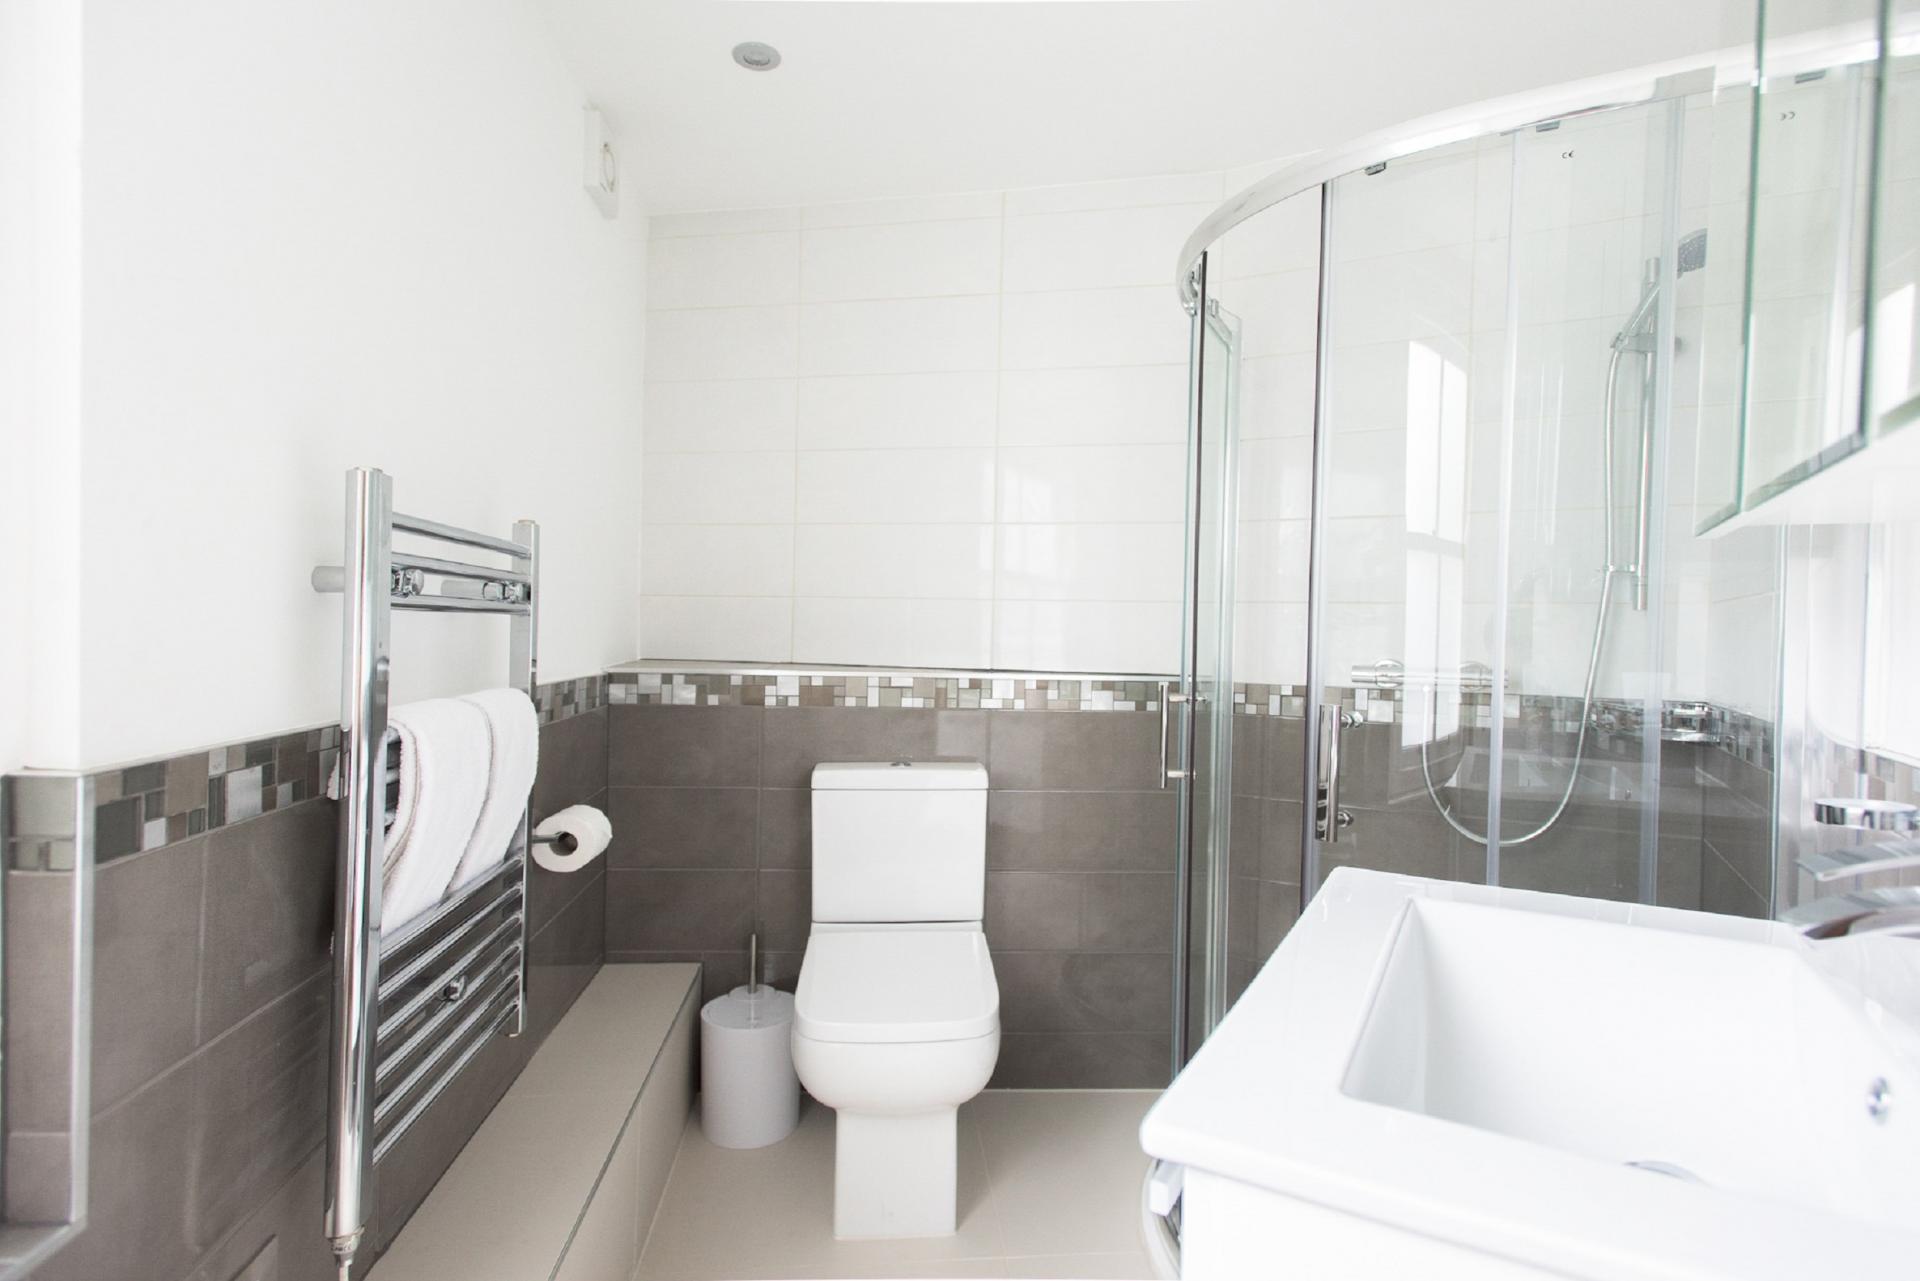 Bathroom at The New Bond Street Loft, Mayfair, London